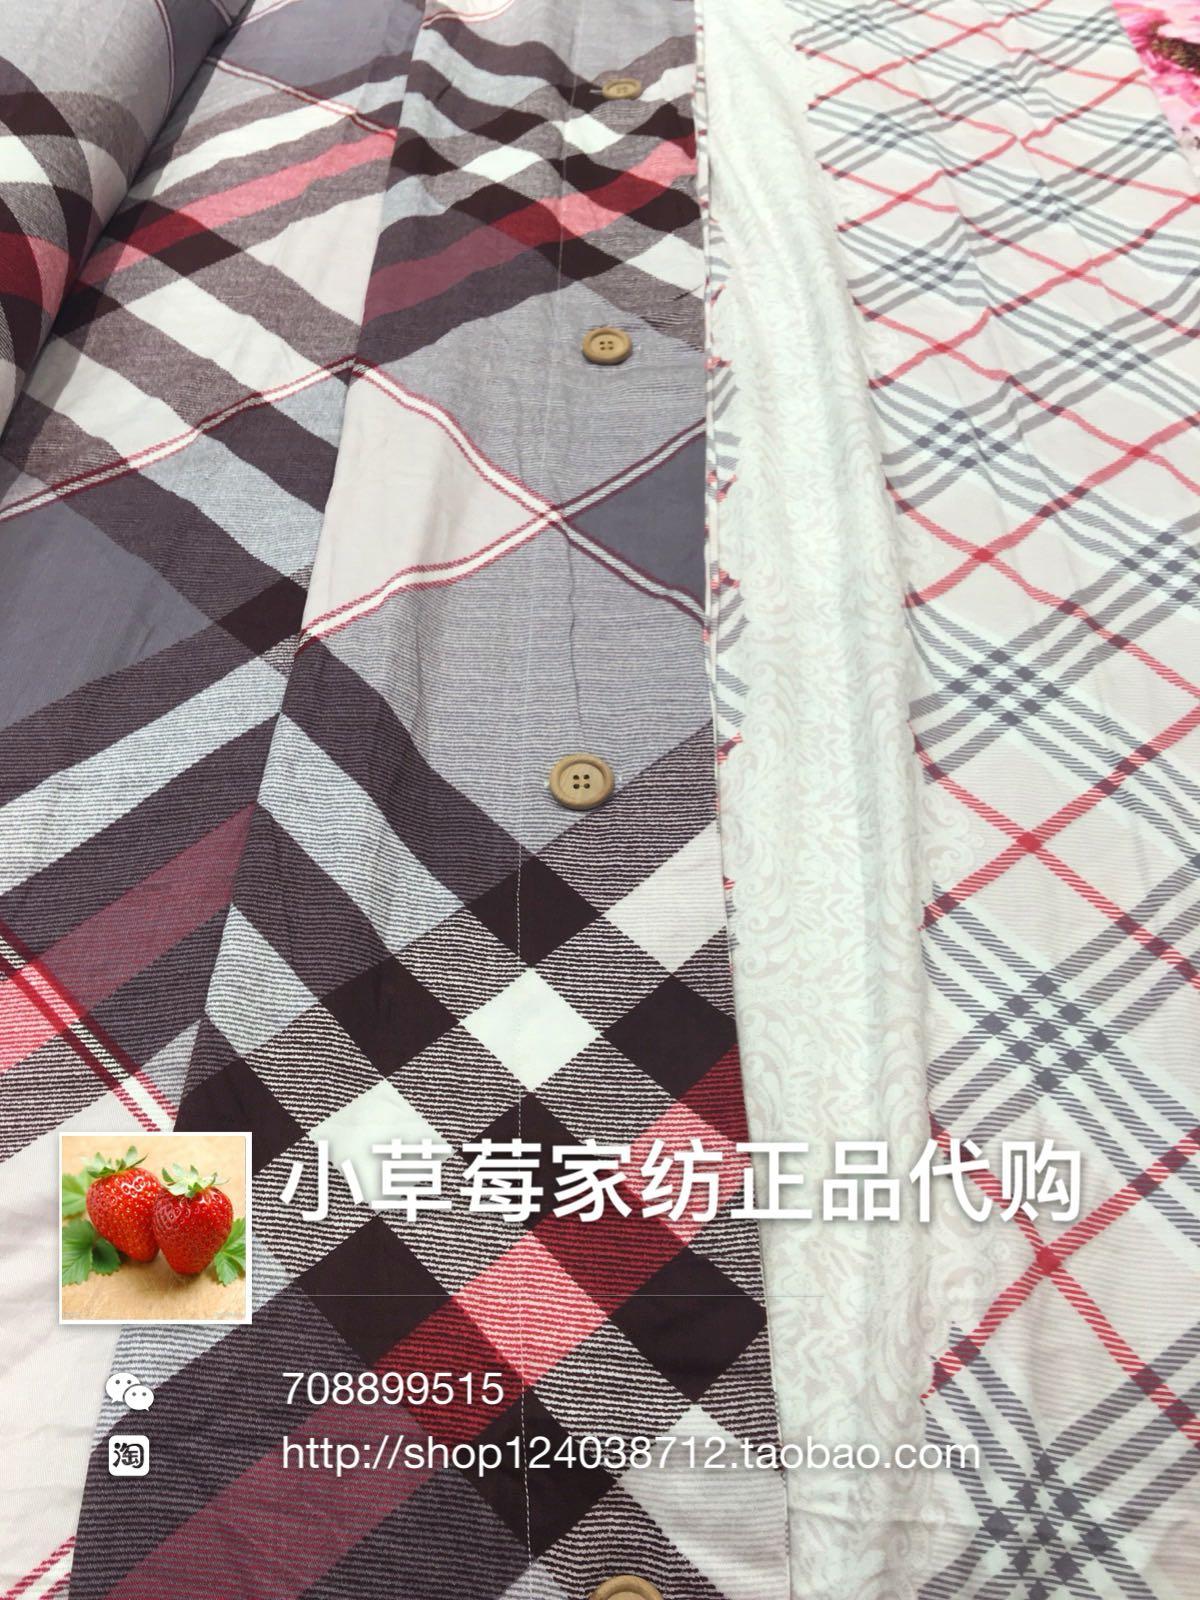 Dream of the mercury textile 2015 Tencel sanding sijiantao fall Hua TY1282-K04S04